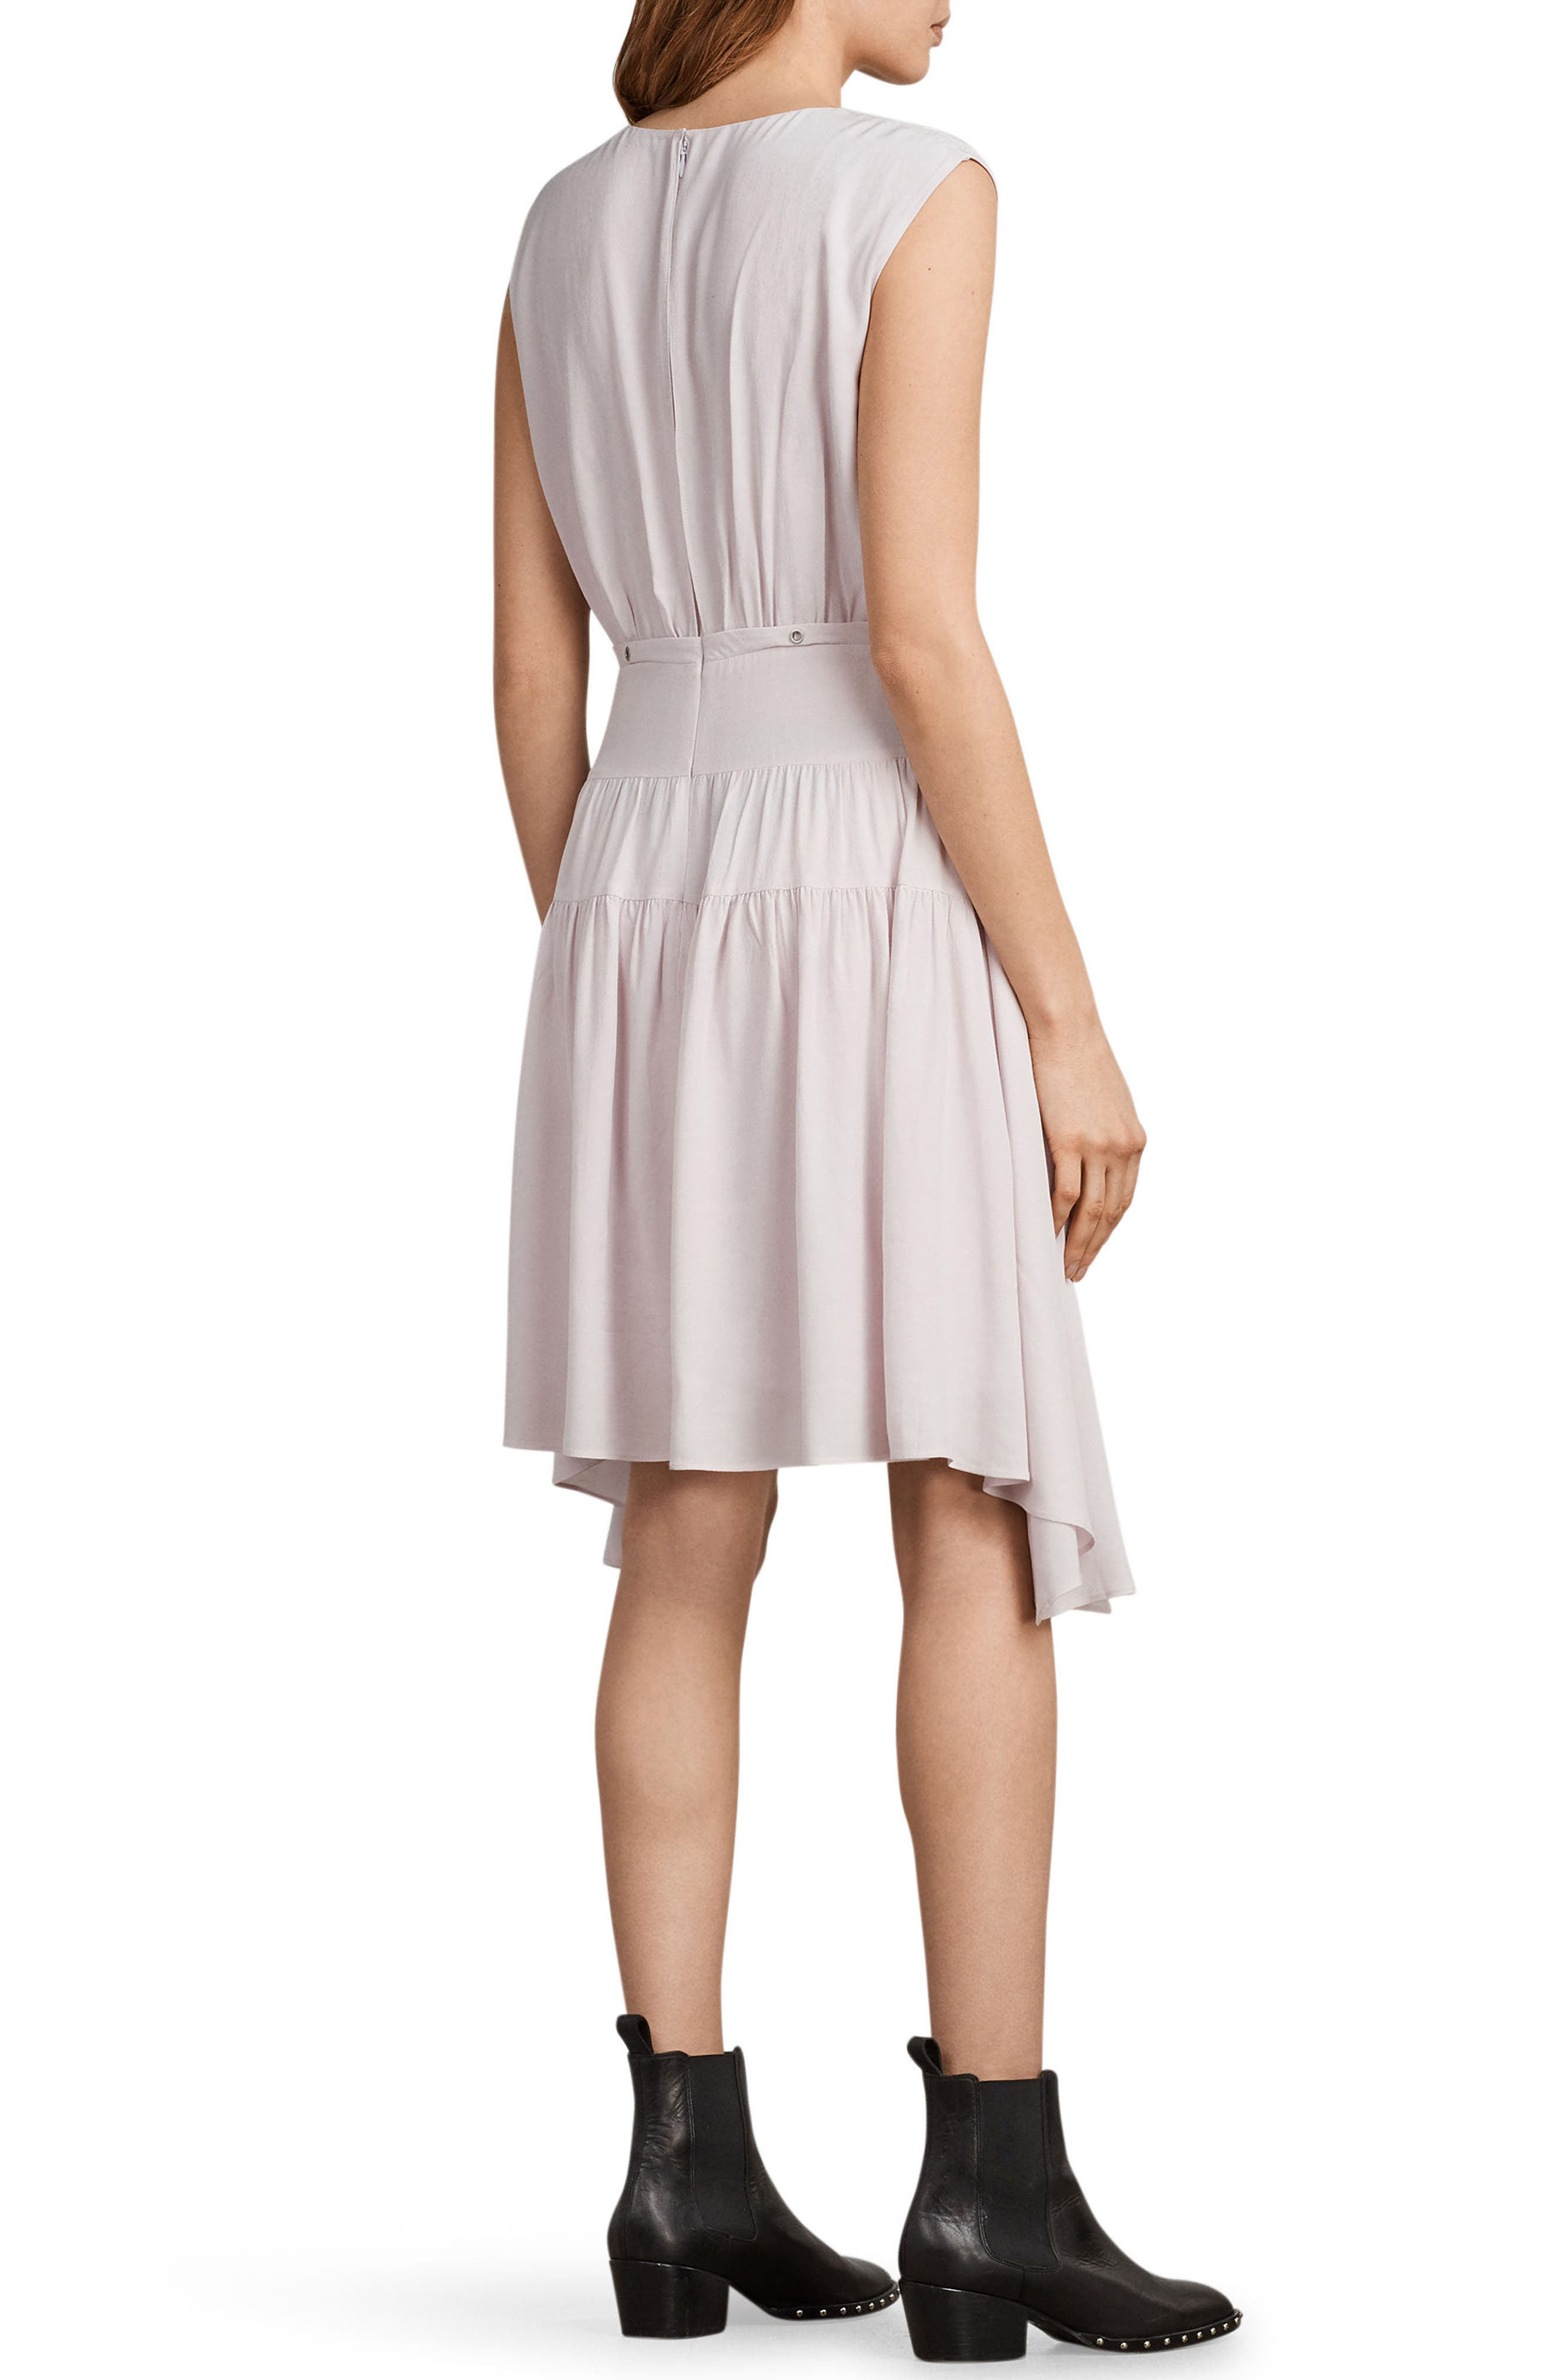 Miller Lace-Up Dress,                             Alternate thumbnail 2, color,                             691